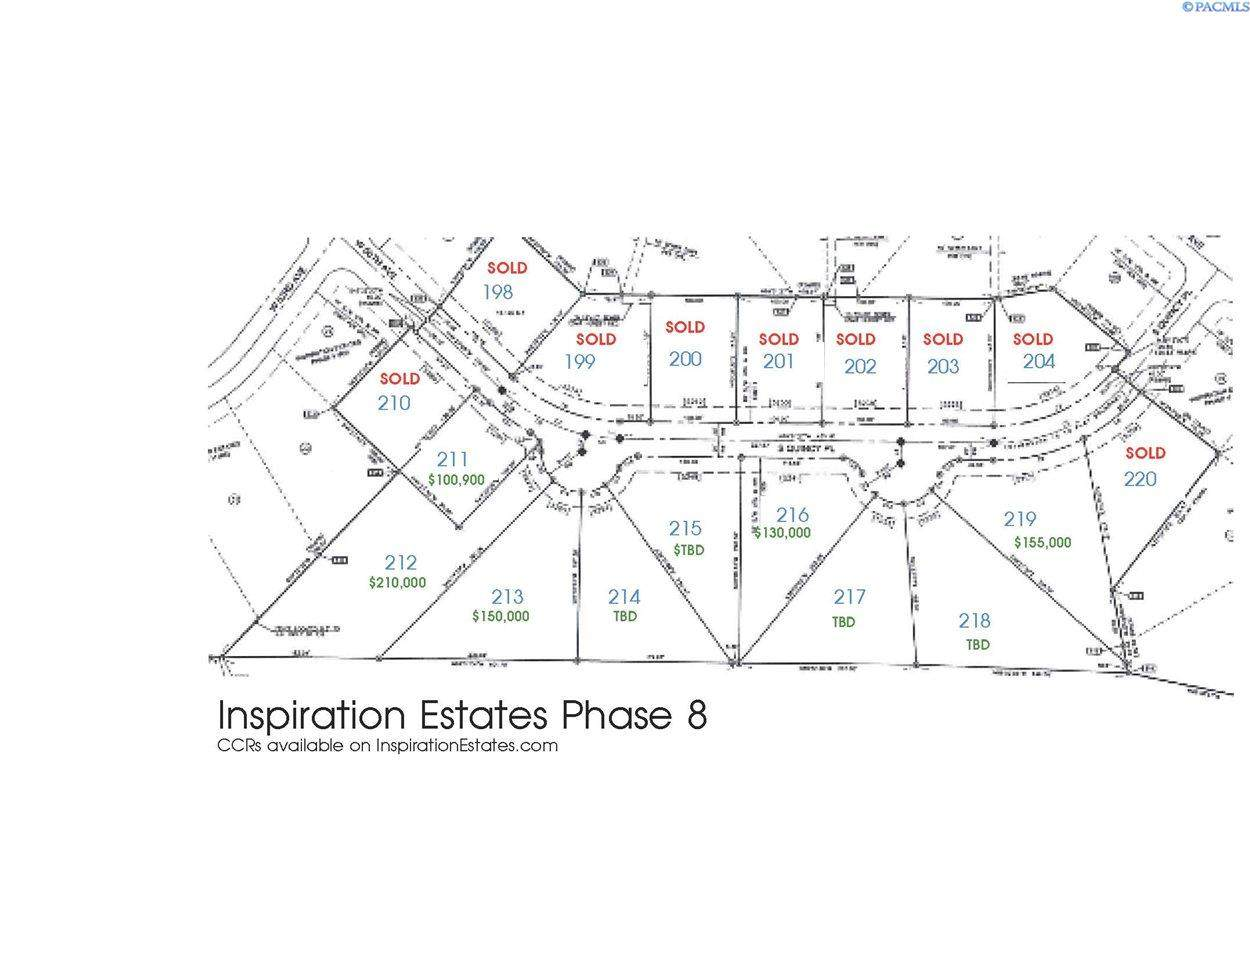 IE LOT 217 Phase Viii - Photo 1